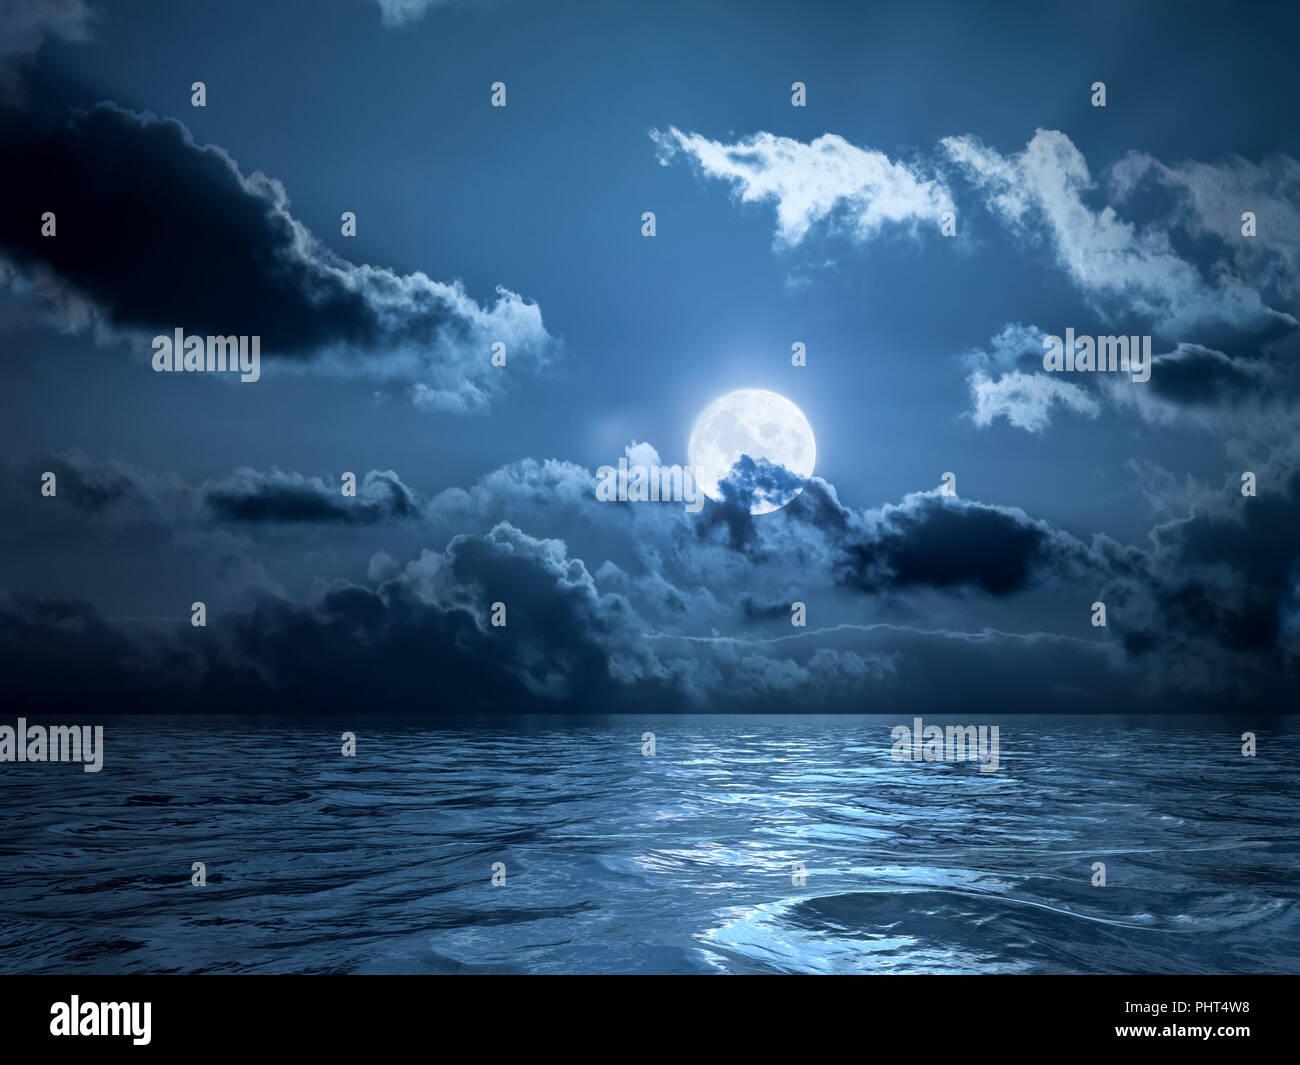 Full moon over the ocean - Stock Image